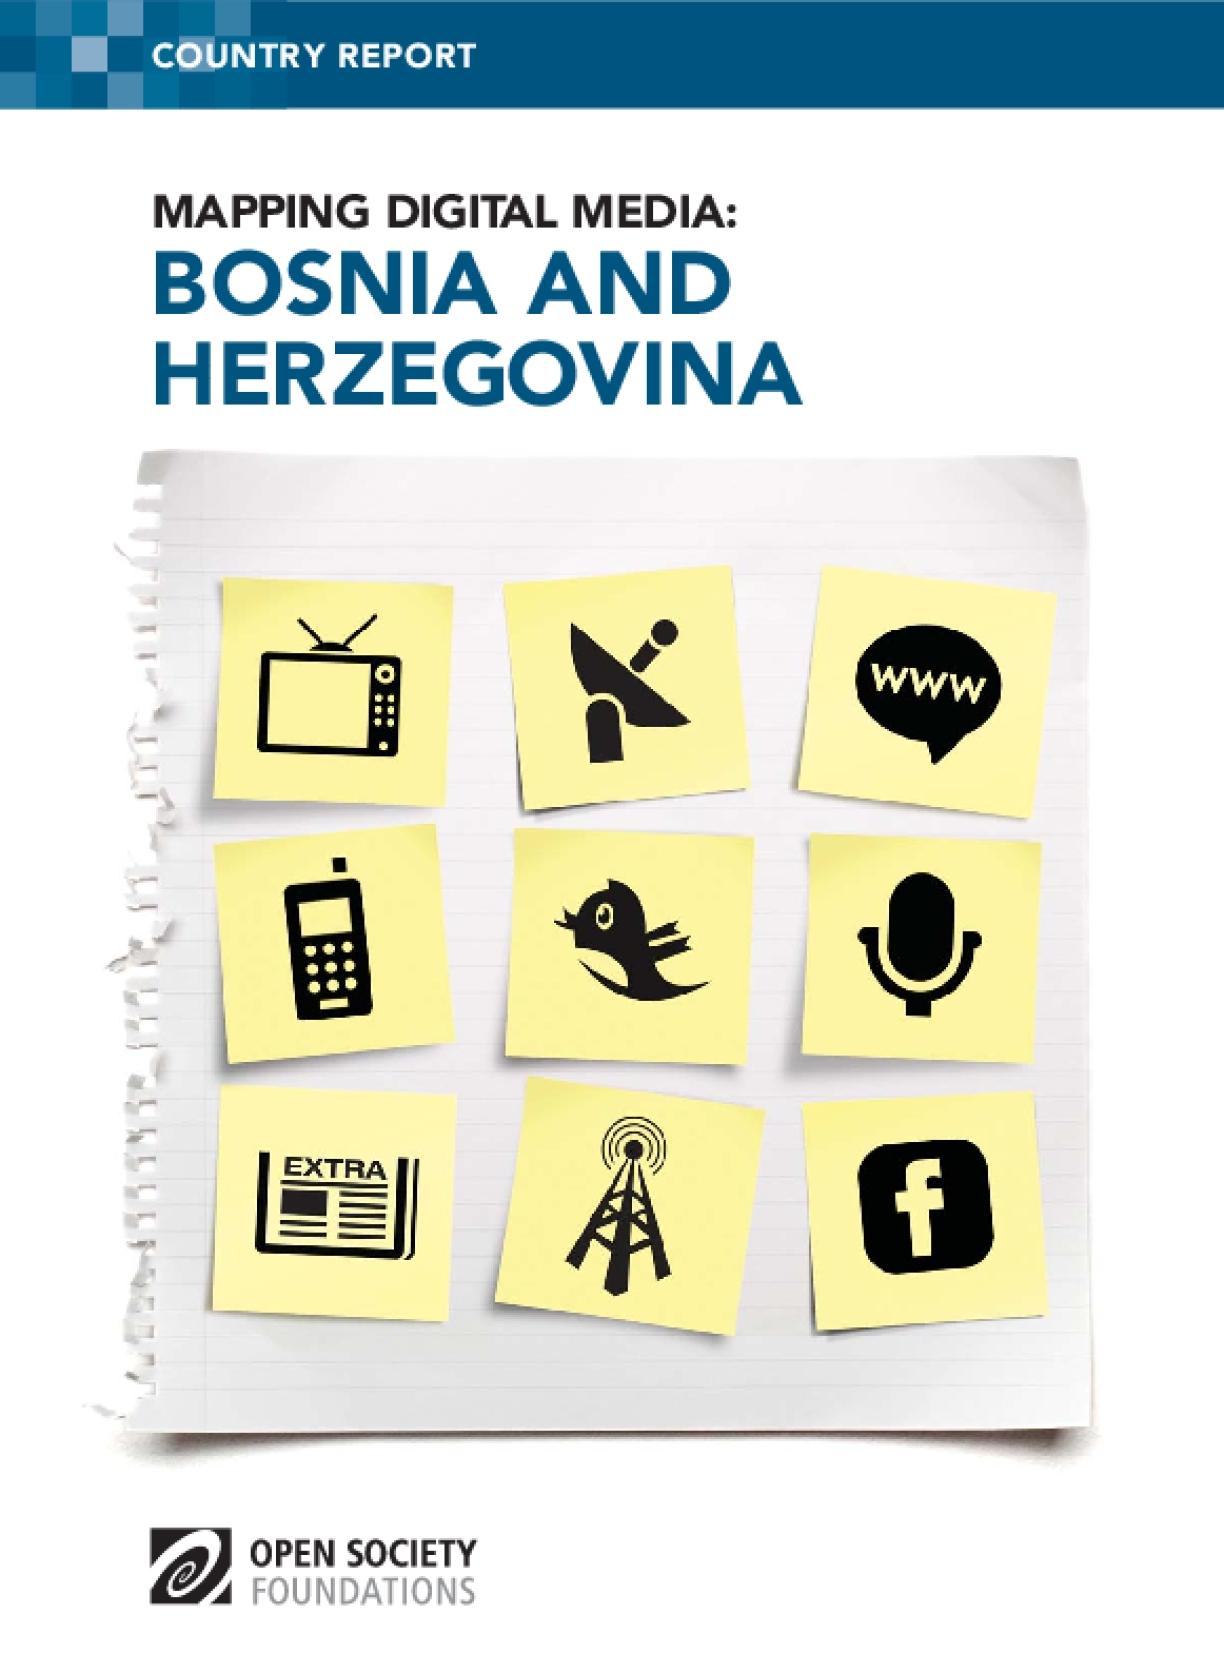 Mapping Digital Media: Bosnia and Herzegovina